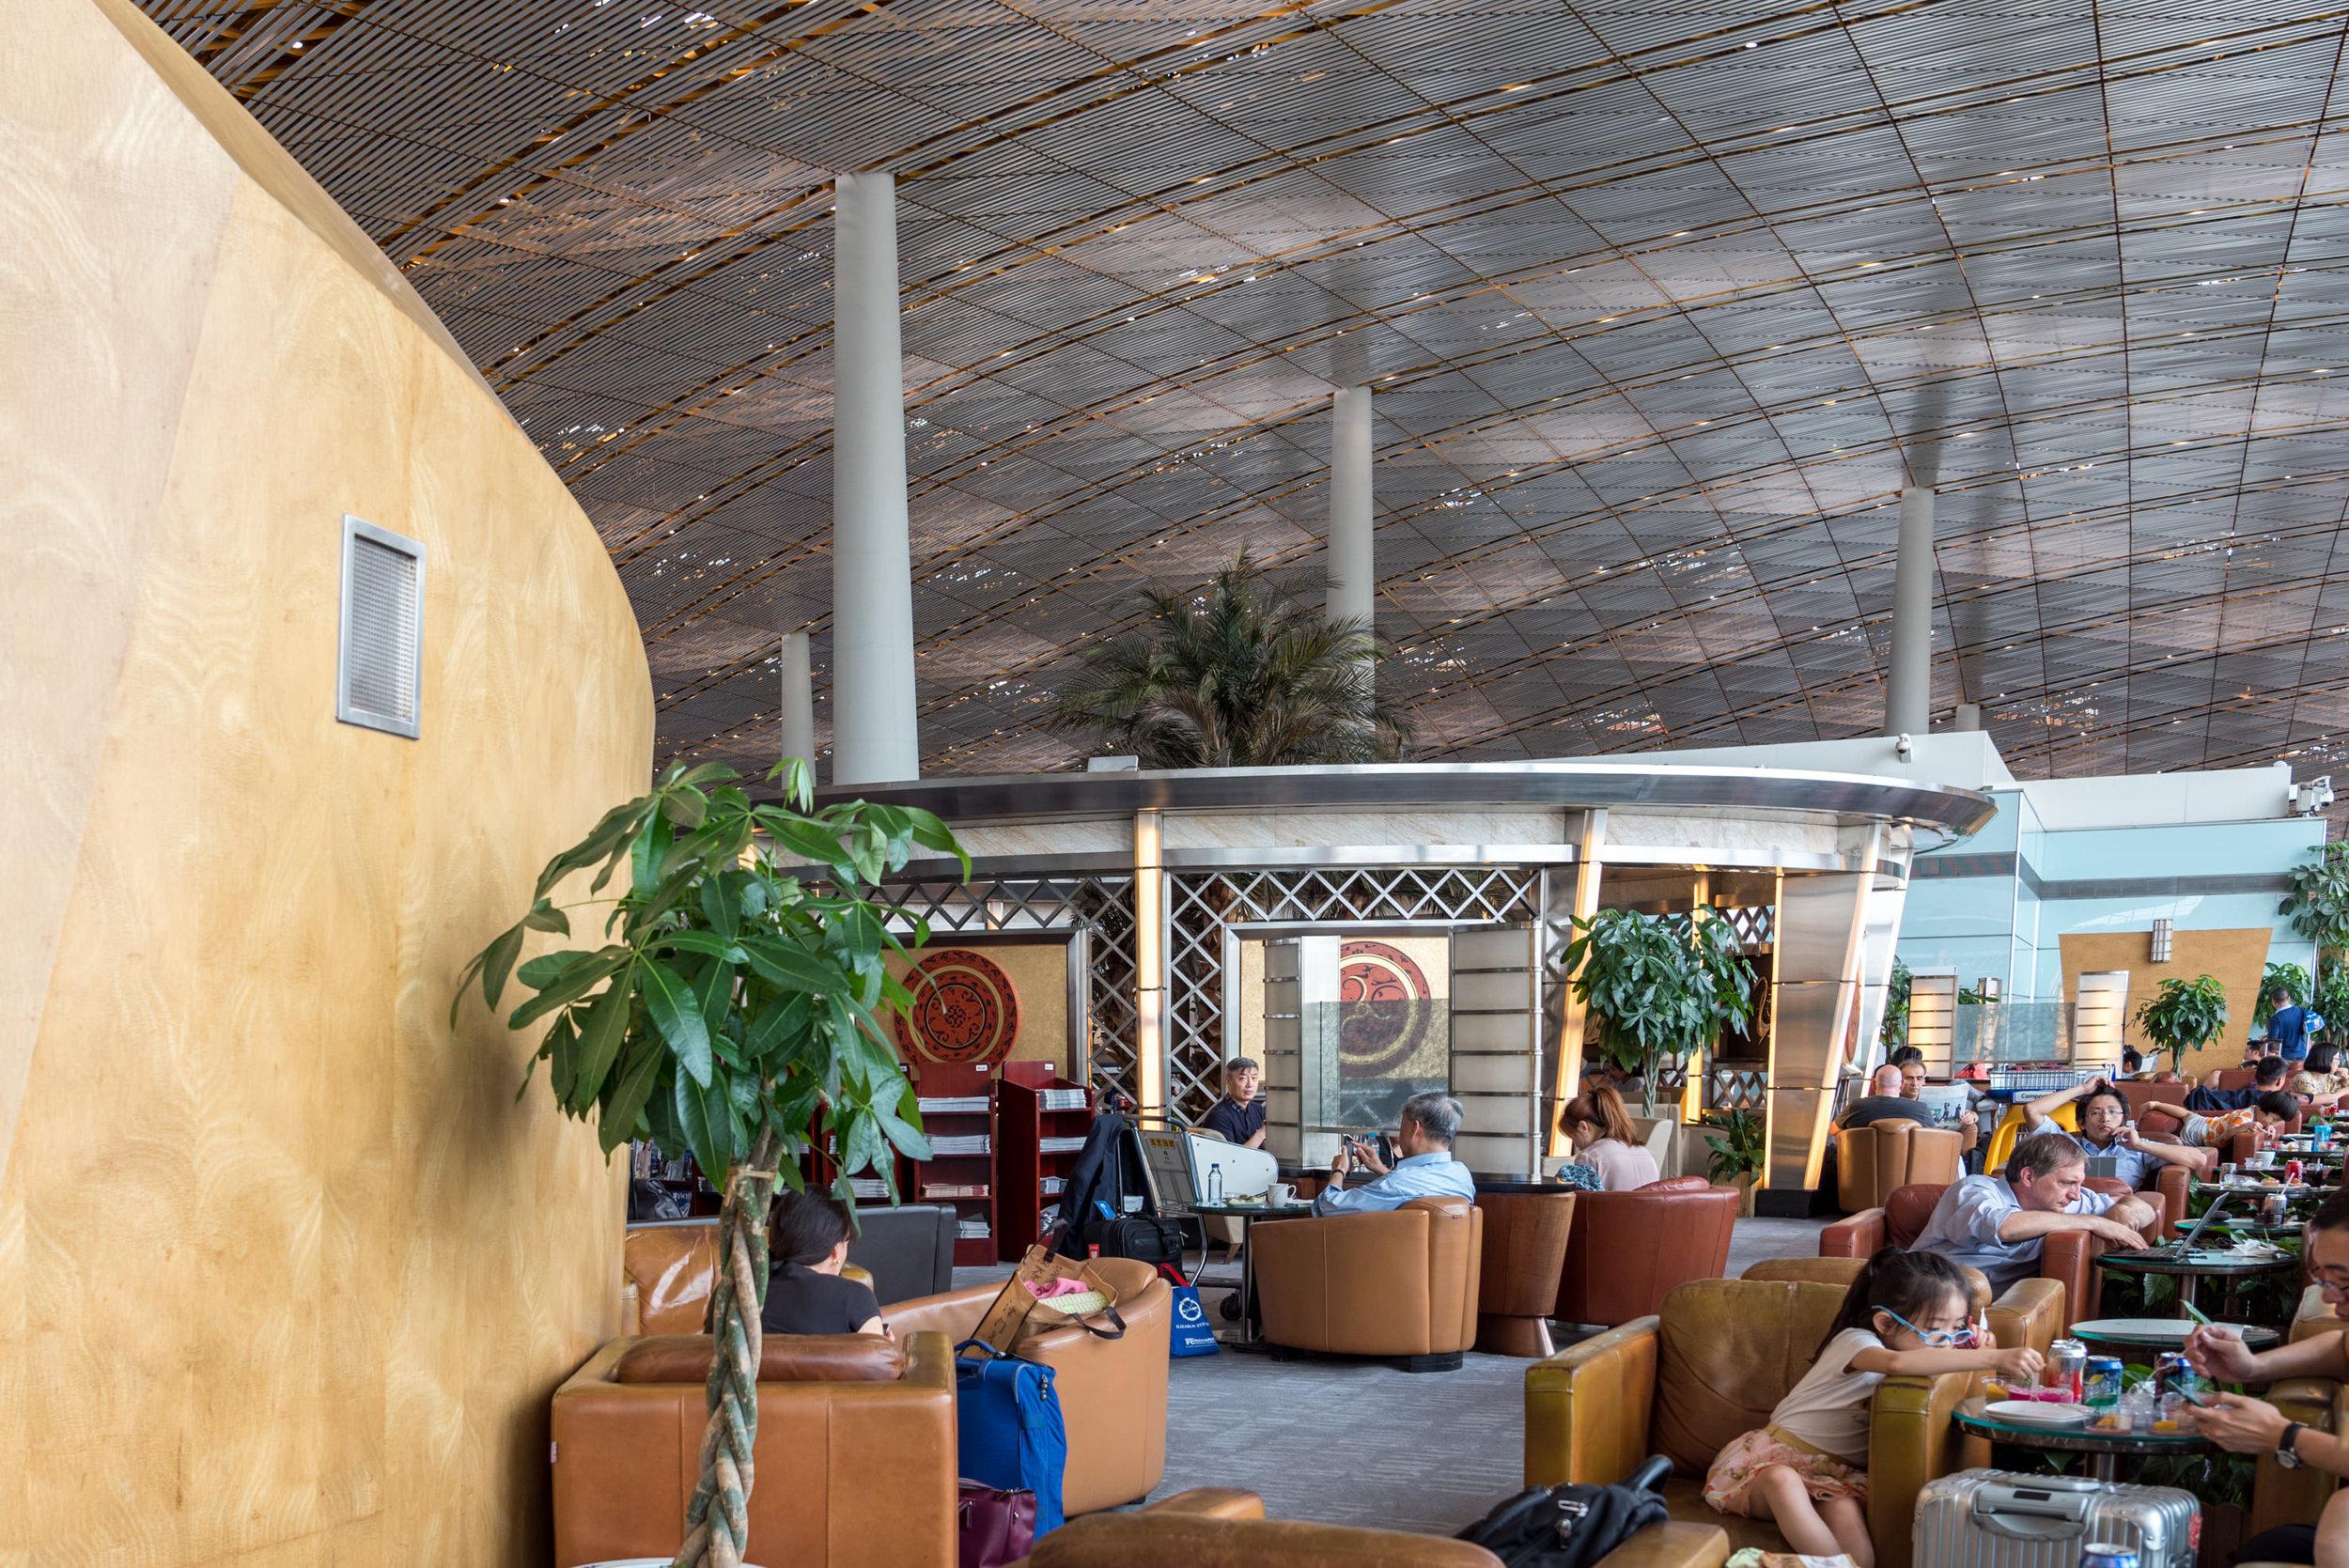 Air China International Business Class Lounge  Beijing Capital International Airport (PEK)